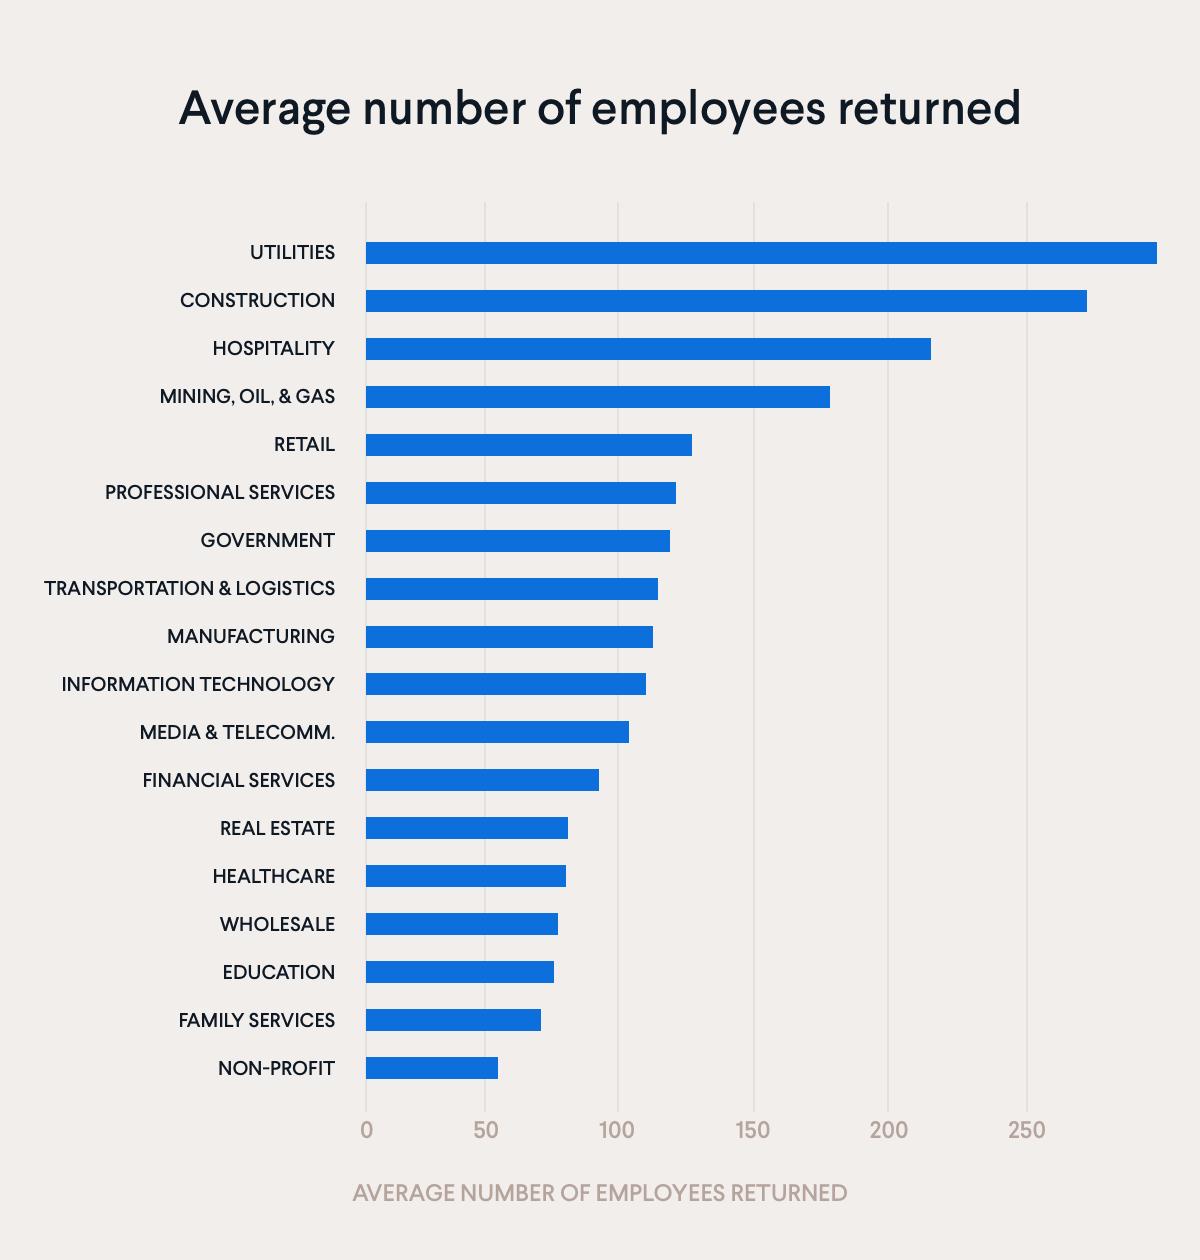 Average number of employees returned